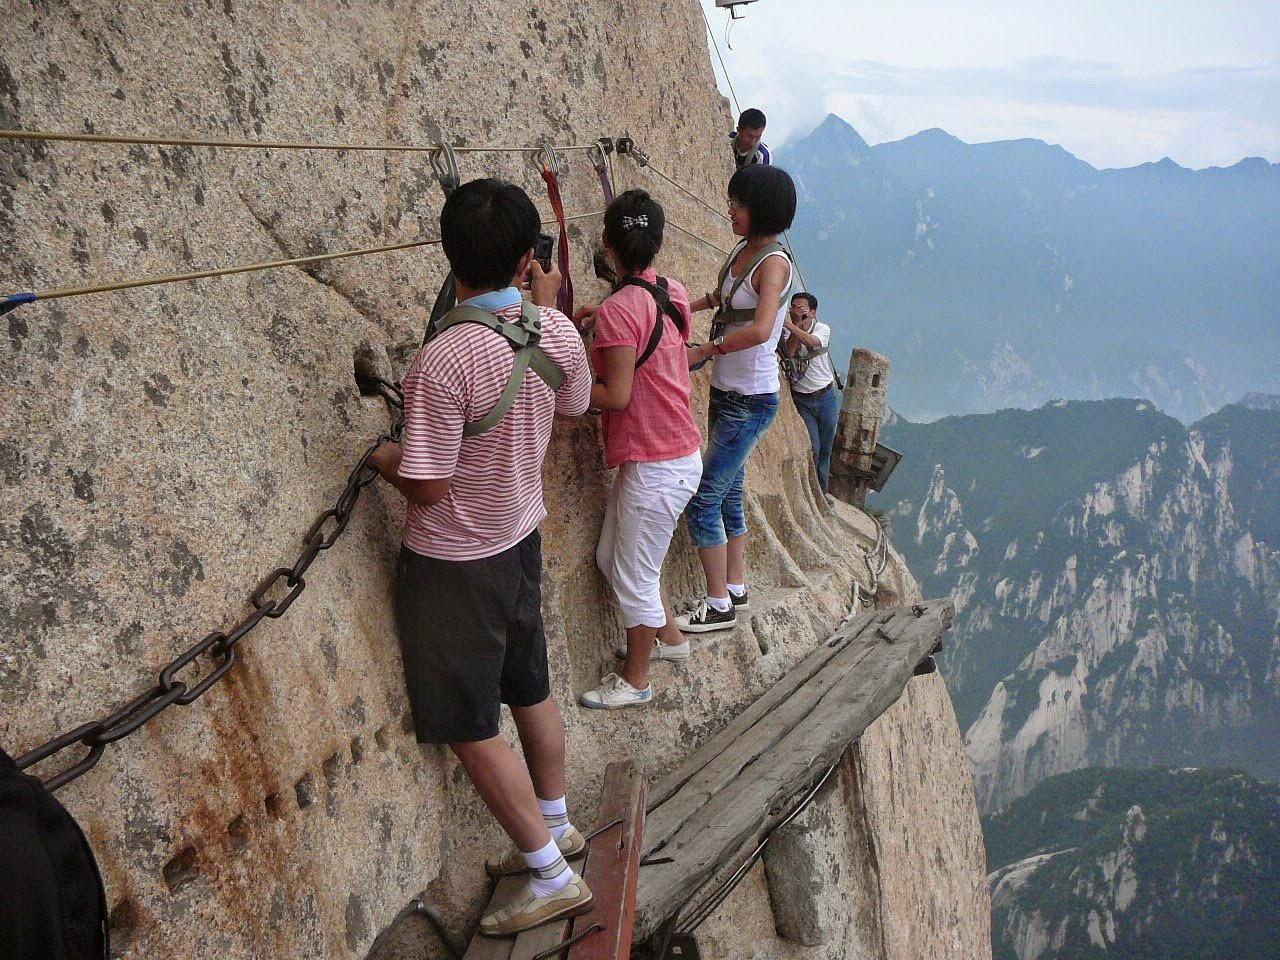 Mount Hua West peak. China: